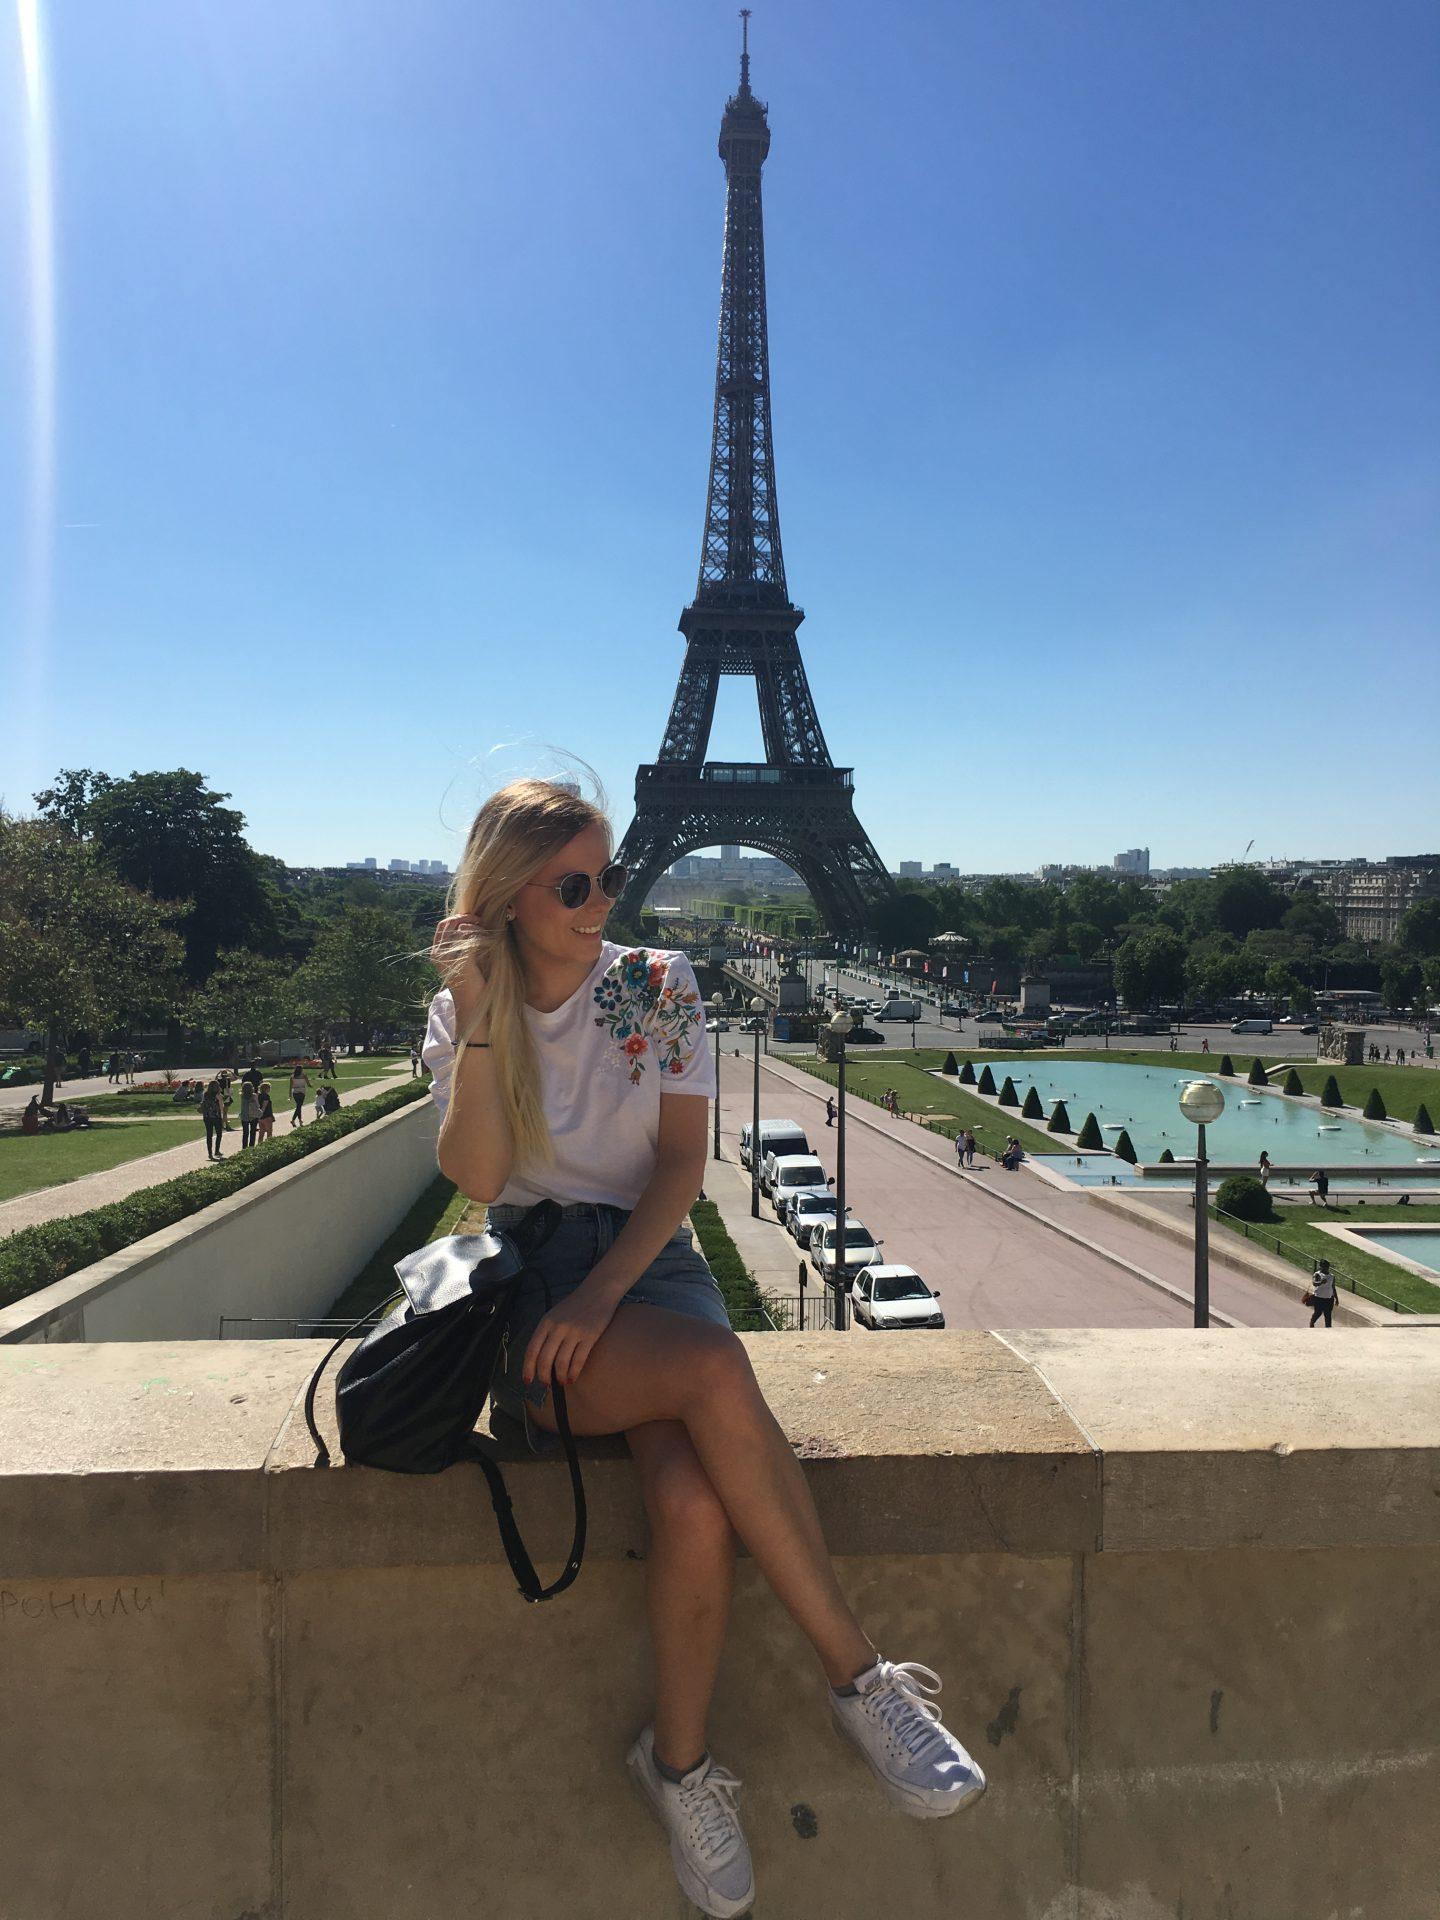 Mon premier voyage en Europe